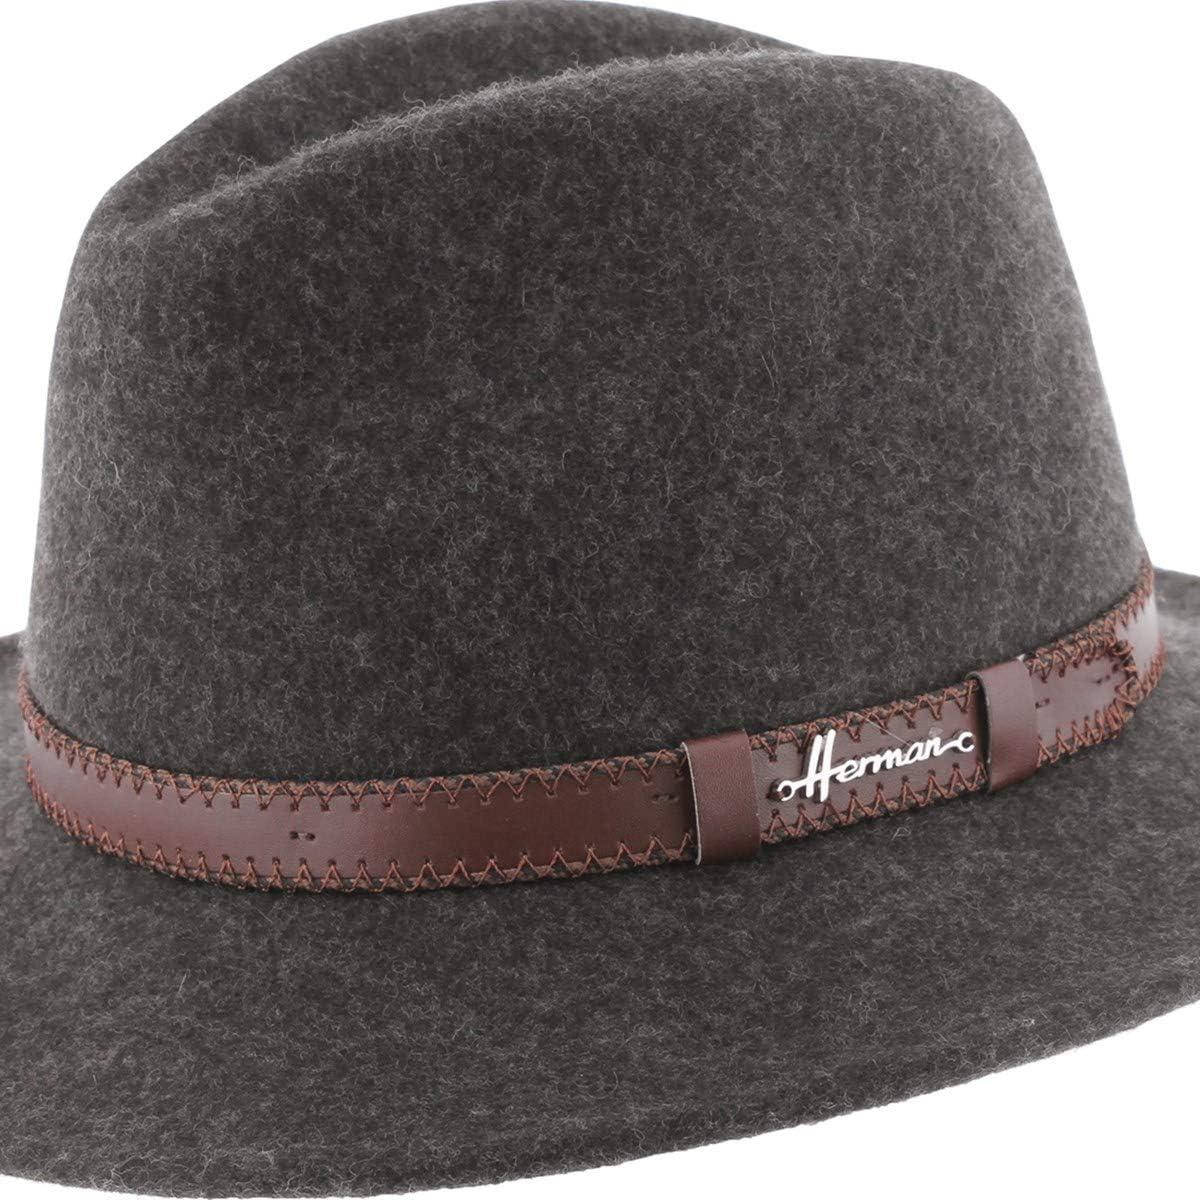 Herman Headwear Chapeau Feutre de Laine Grand Bord Ceinture Mac Lorca